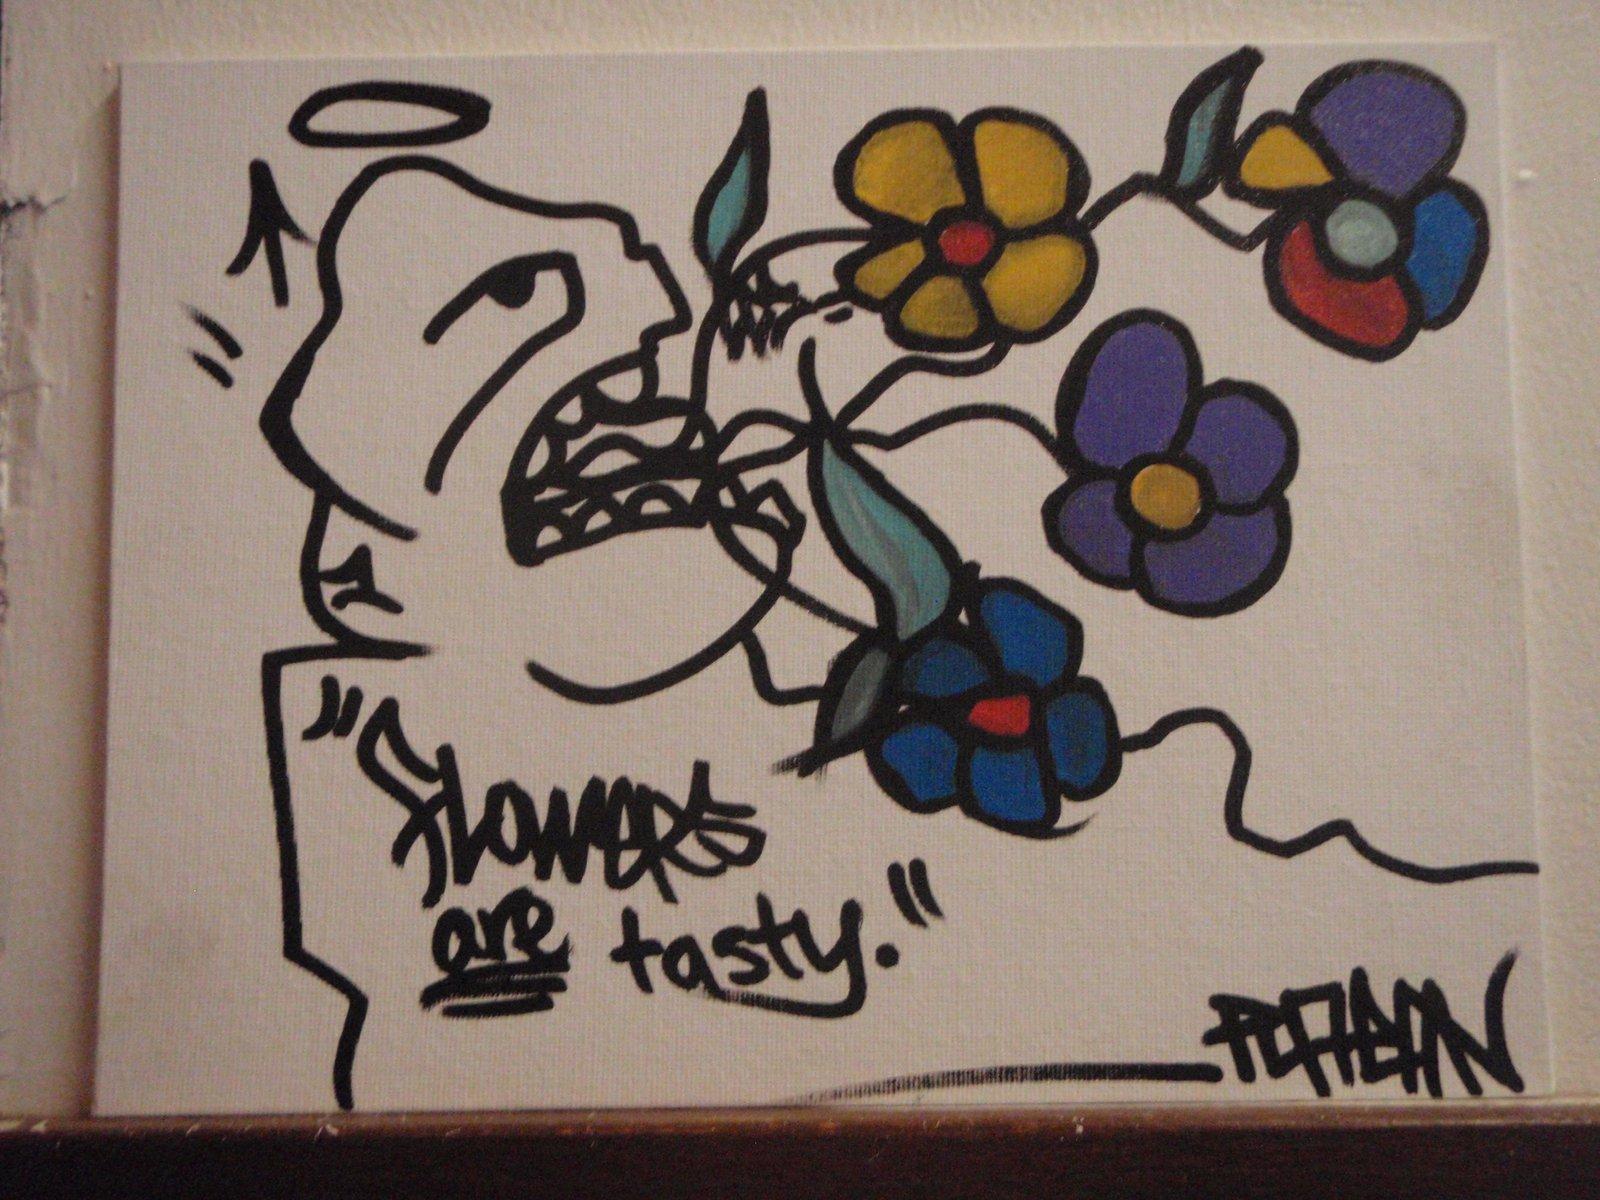 Flowers are tasty